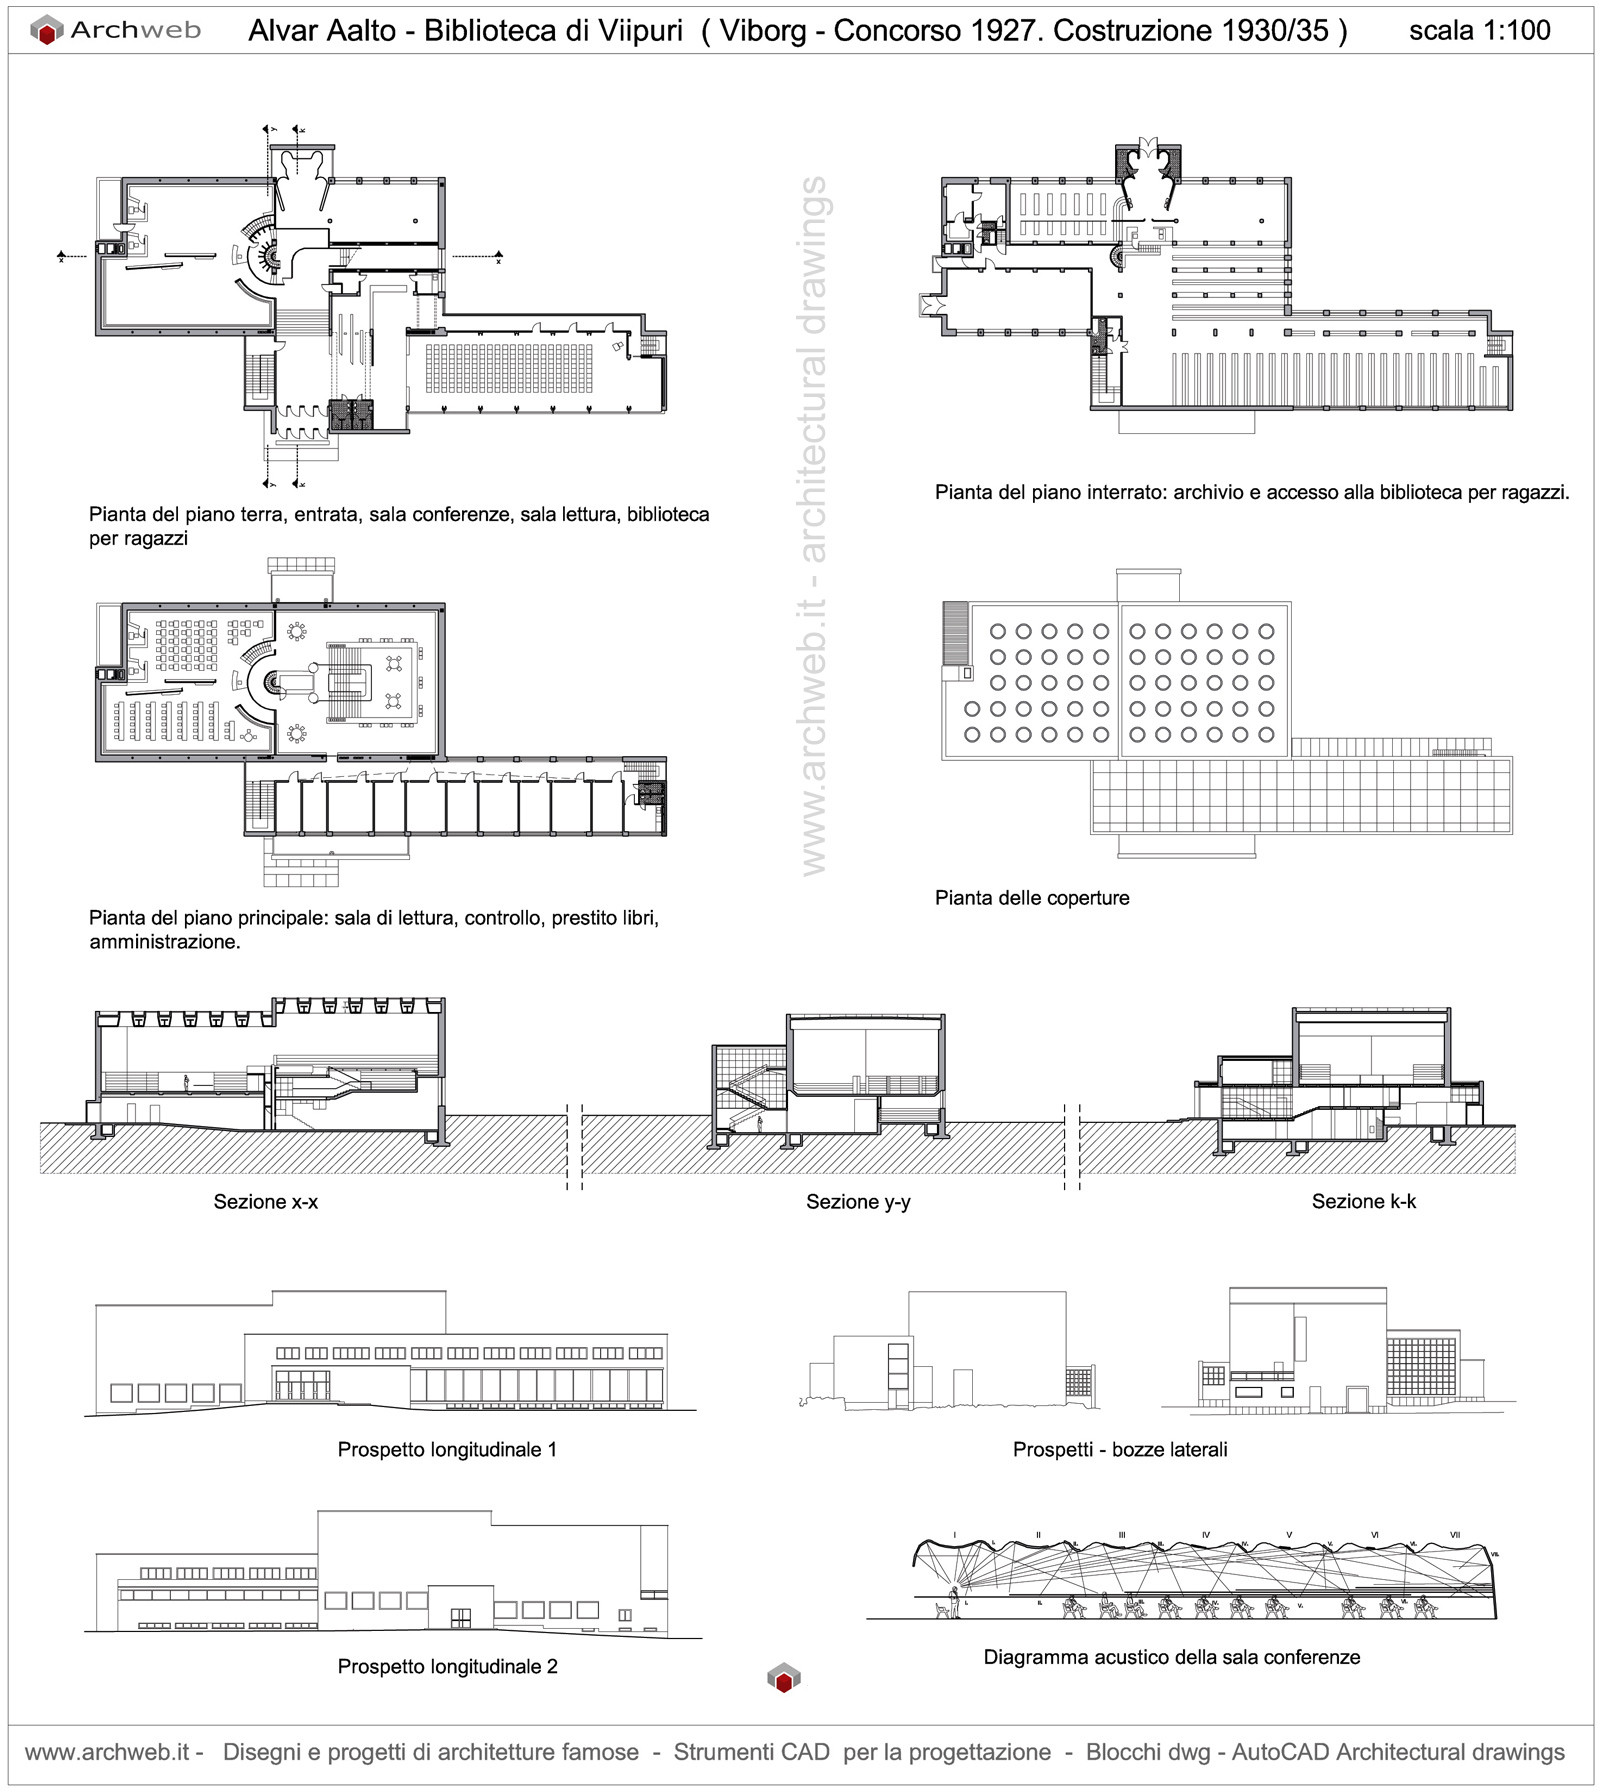 Escuela Ghana as well Id F 1230988 besides 2605366716 besides 503823d428ba0d599b001067 Ad Classics Muuratsalo Experimental House Alvar Aalto Photo as well Viipuri library drawings. on alvar aalto